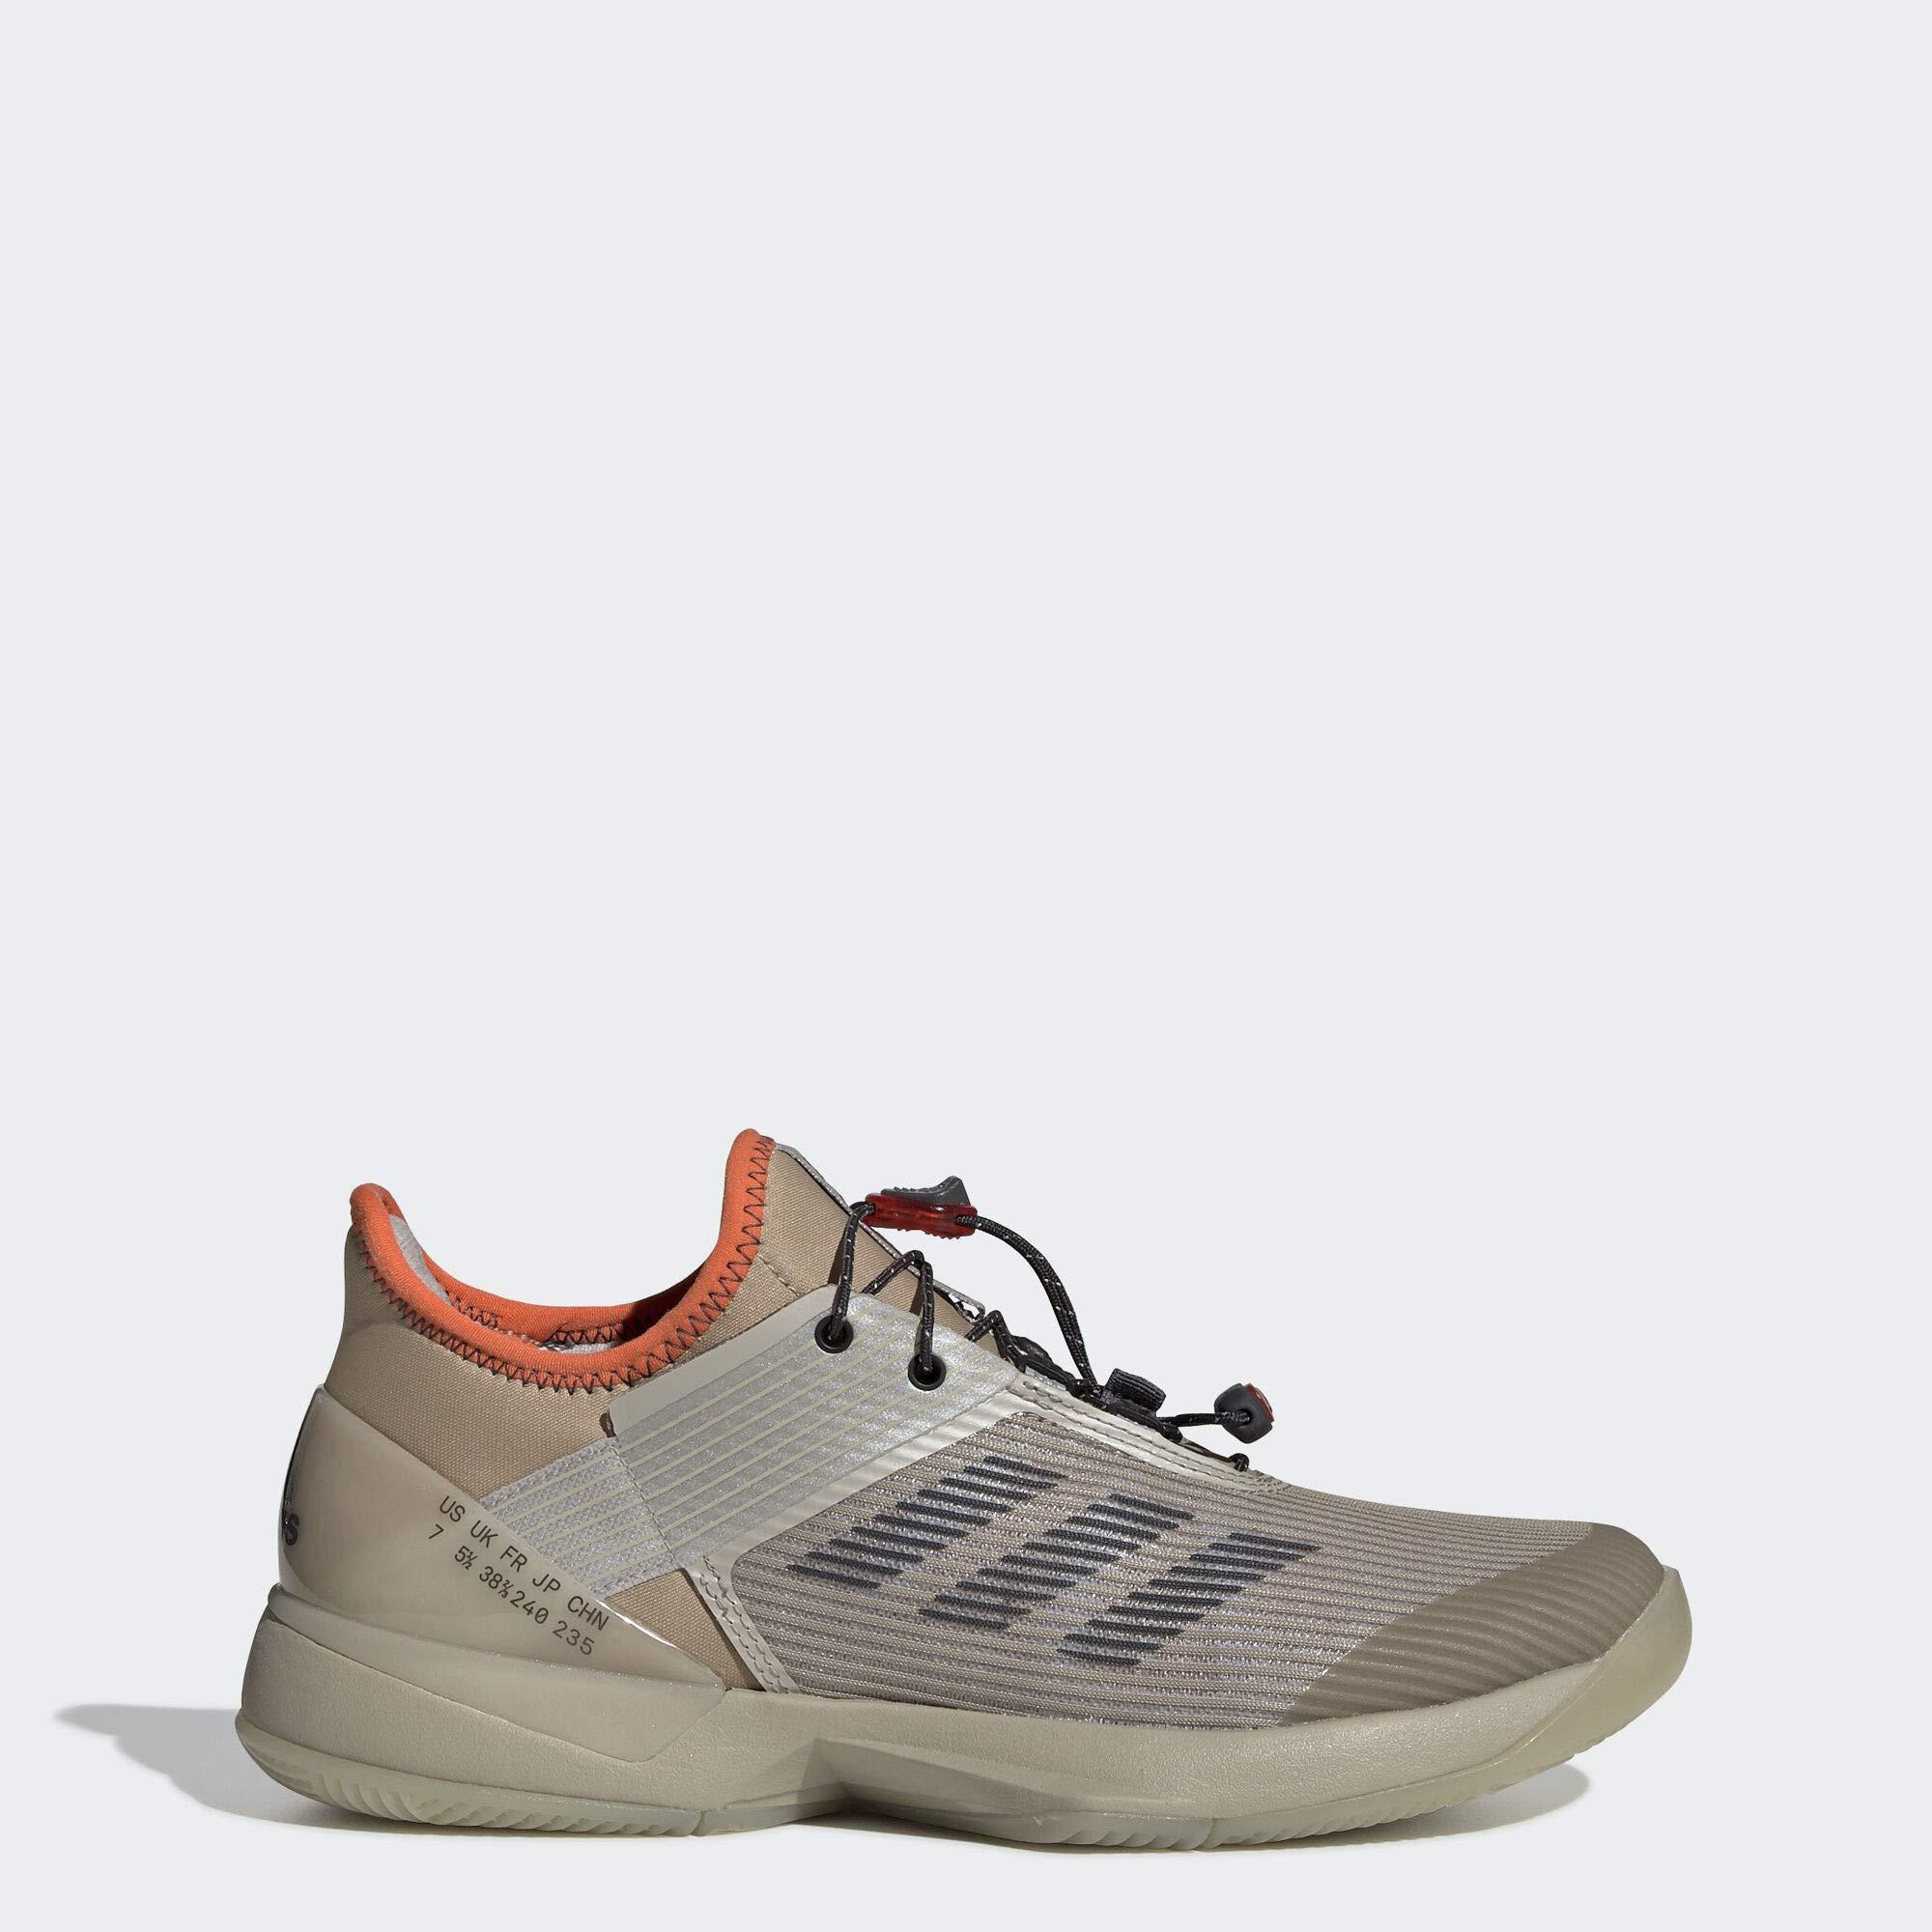 adidas Women's Adizero Ubersonic 3 Citified, Light Brown/Grey/True Orange, 10 M US by adidas